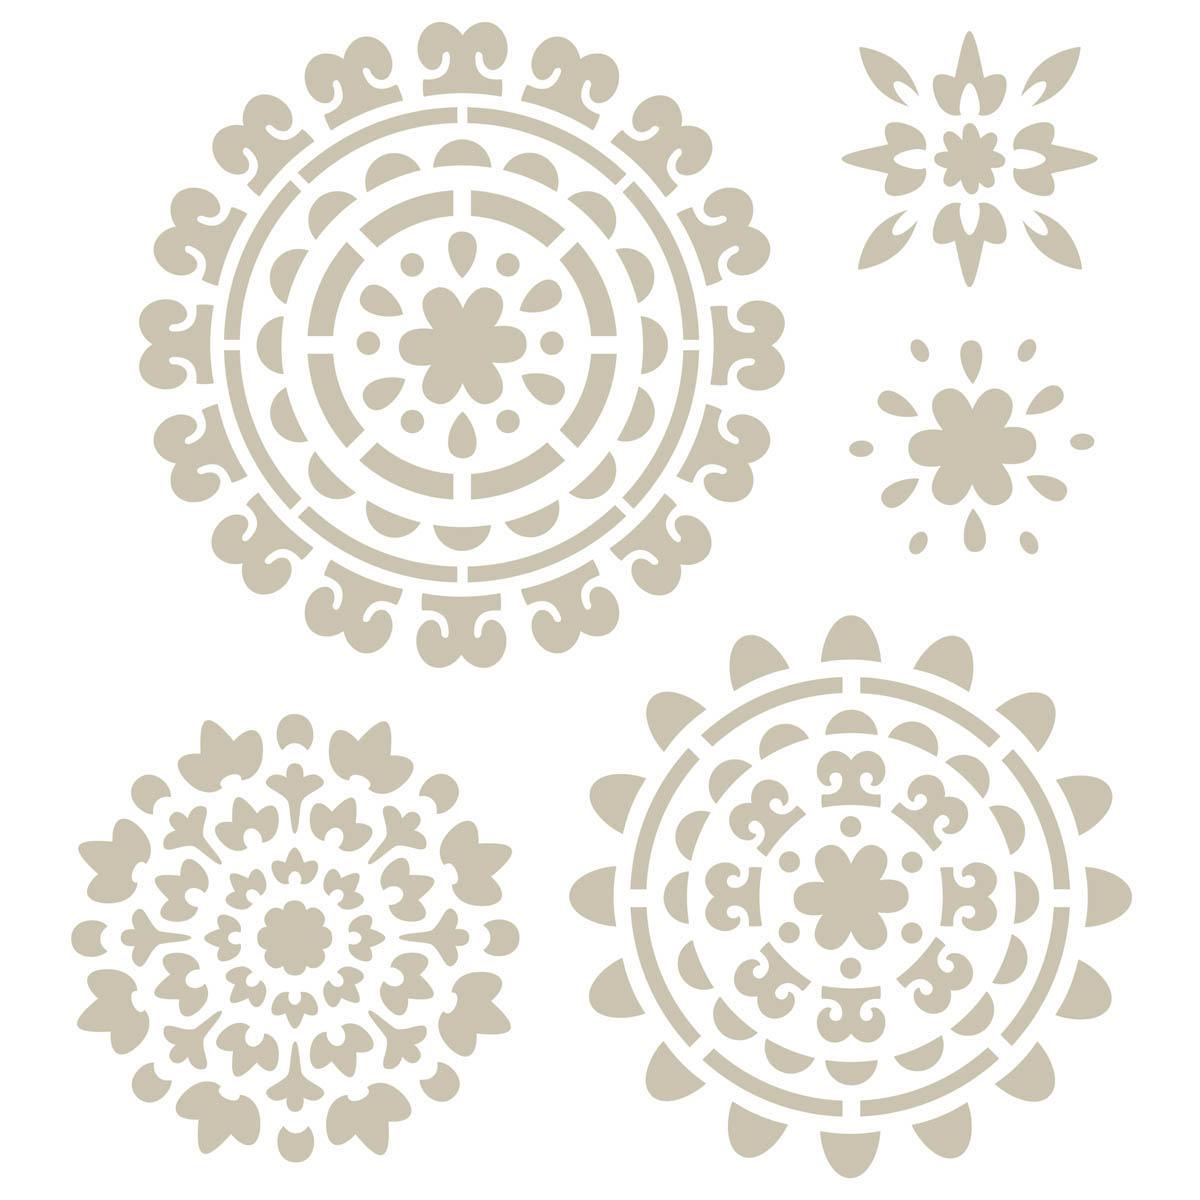 FolkArt ® Handmade Charlotte™ Stencils - Suzani Spendor